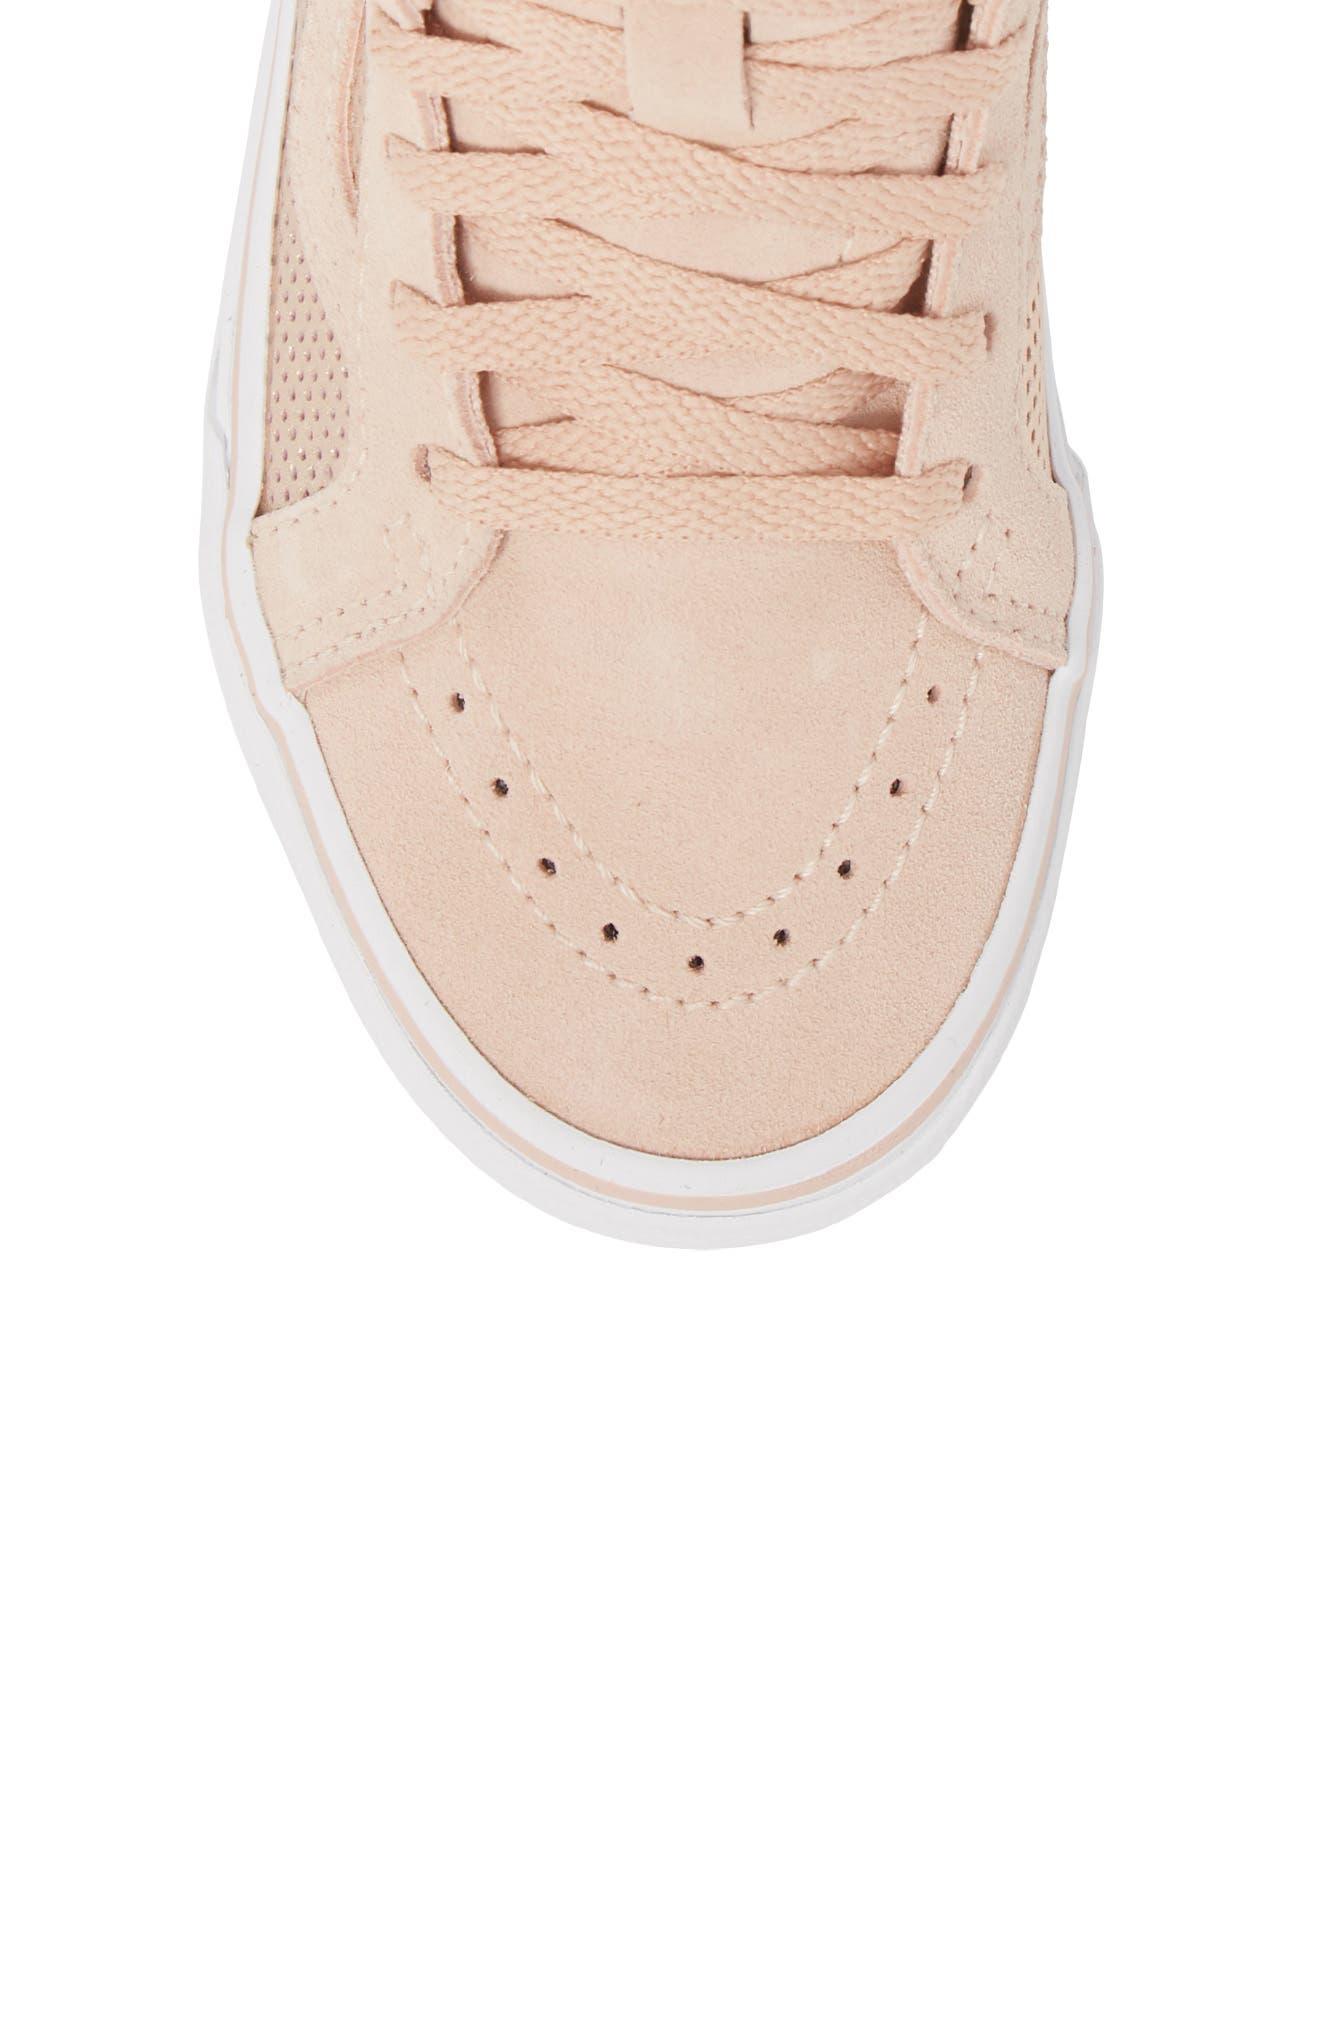 SK8-Hi Zip Sneaker,                             Alternate thumbnail 5, color,                             Rose Gold Suede Leather